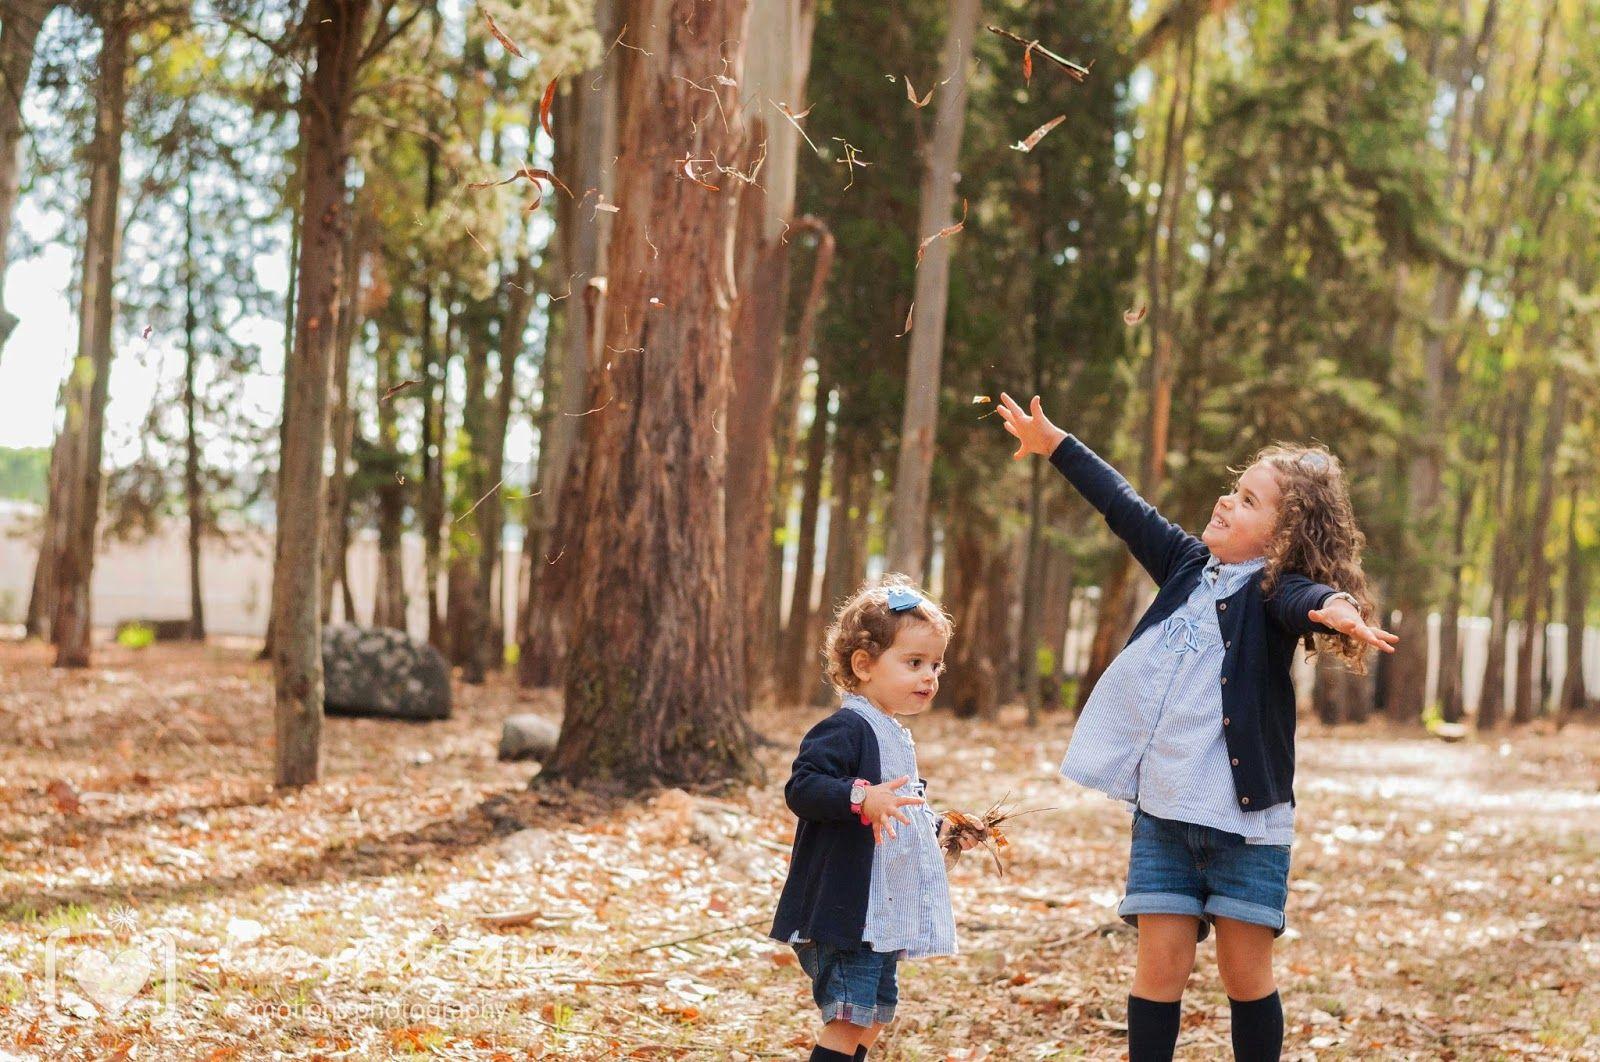 e-motions photography: joyful session